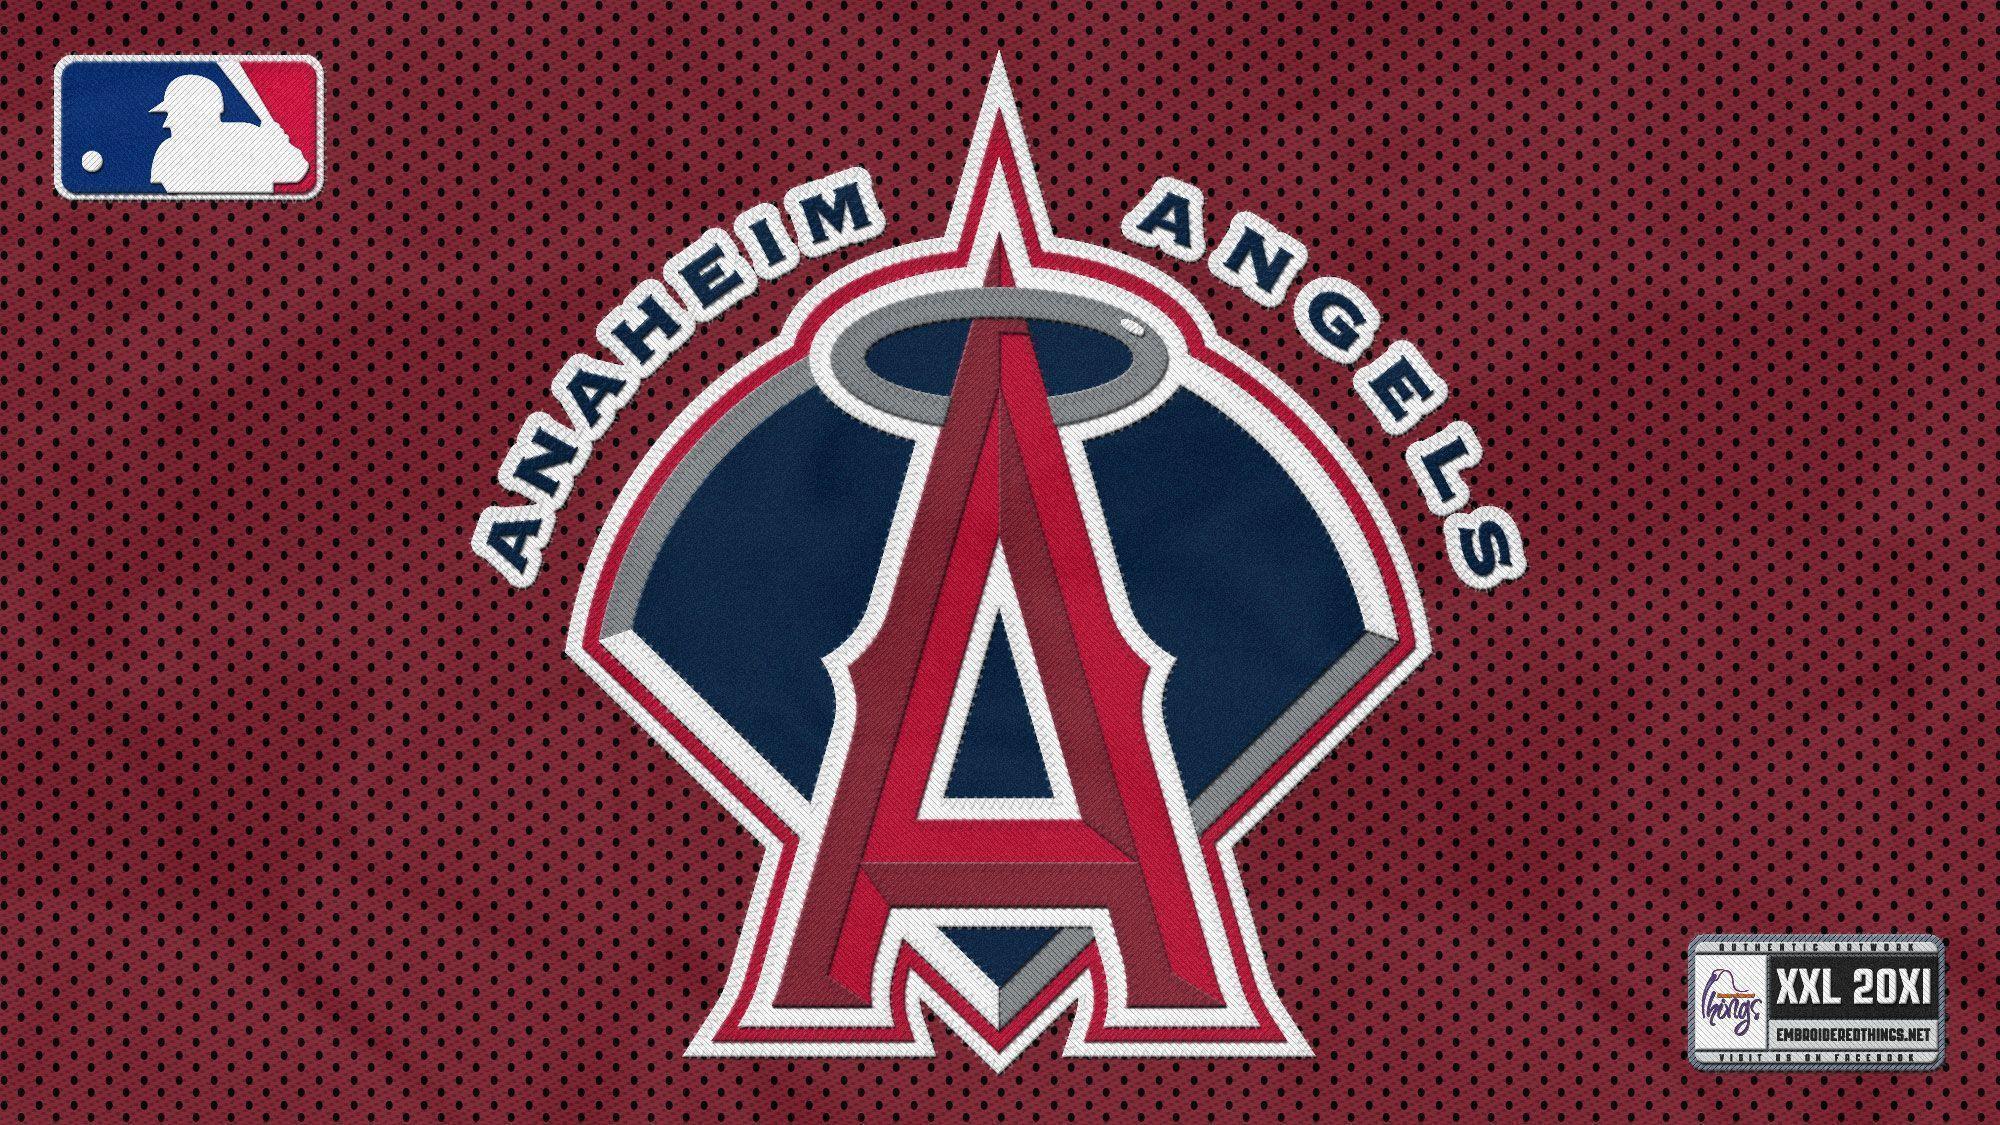 Cached Angels baseball logo images